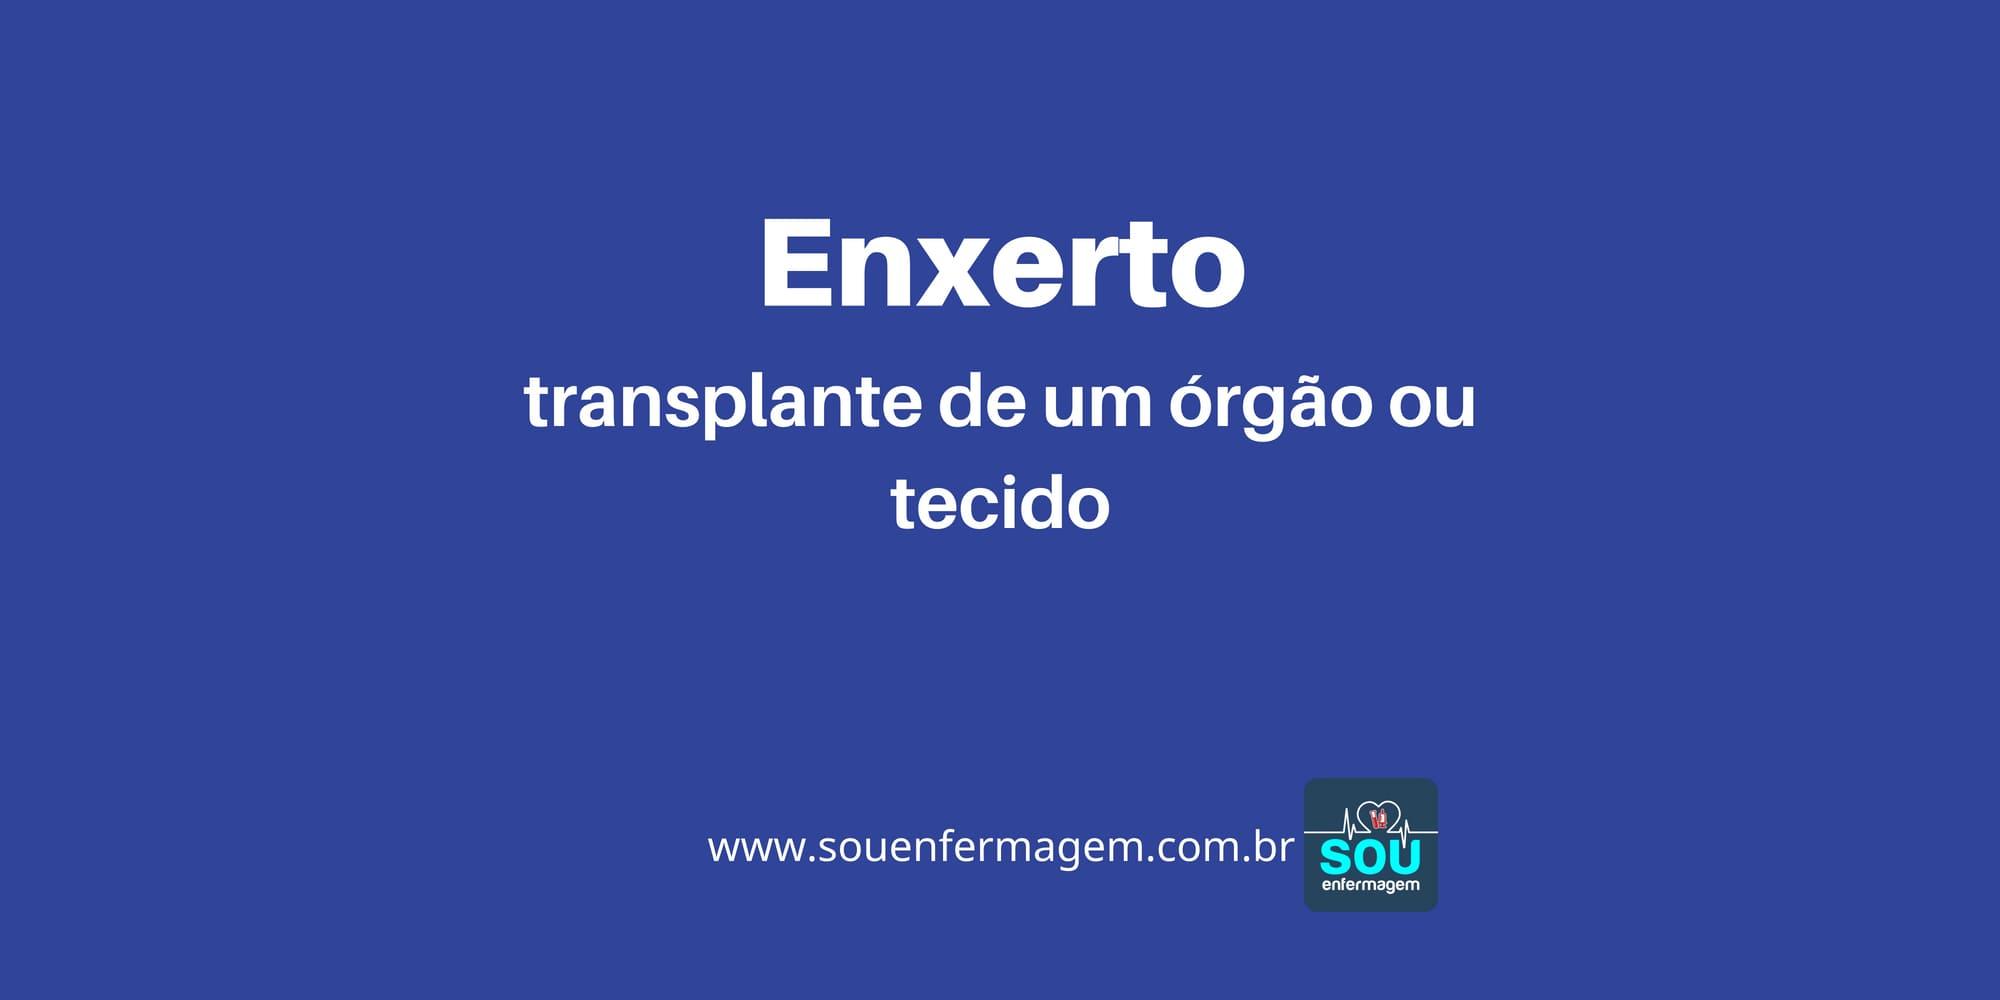 Enxerto